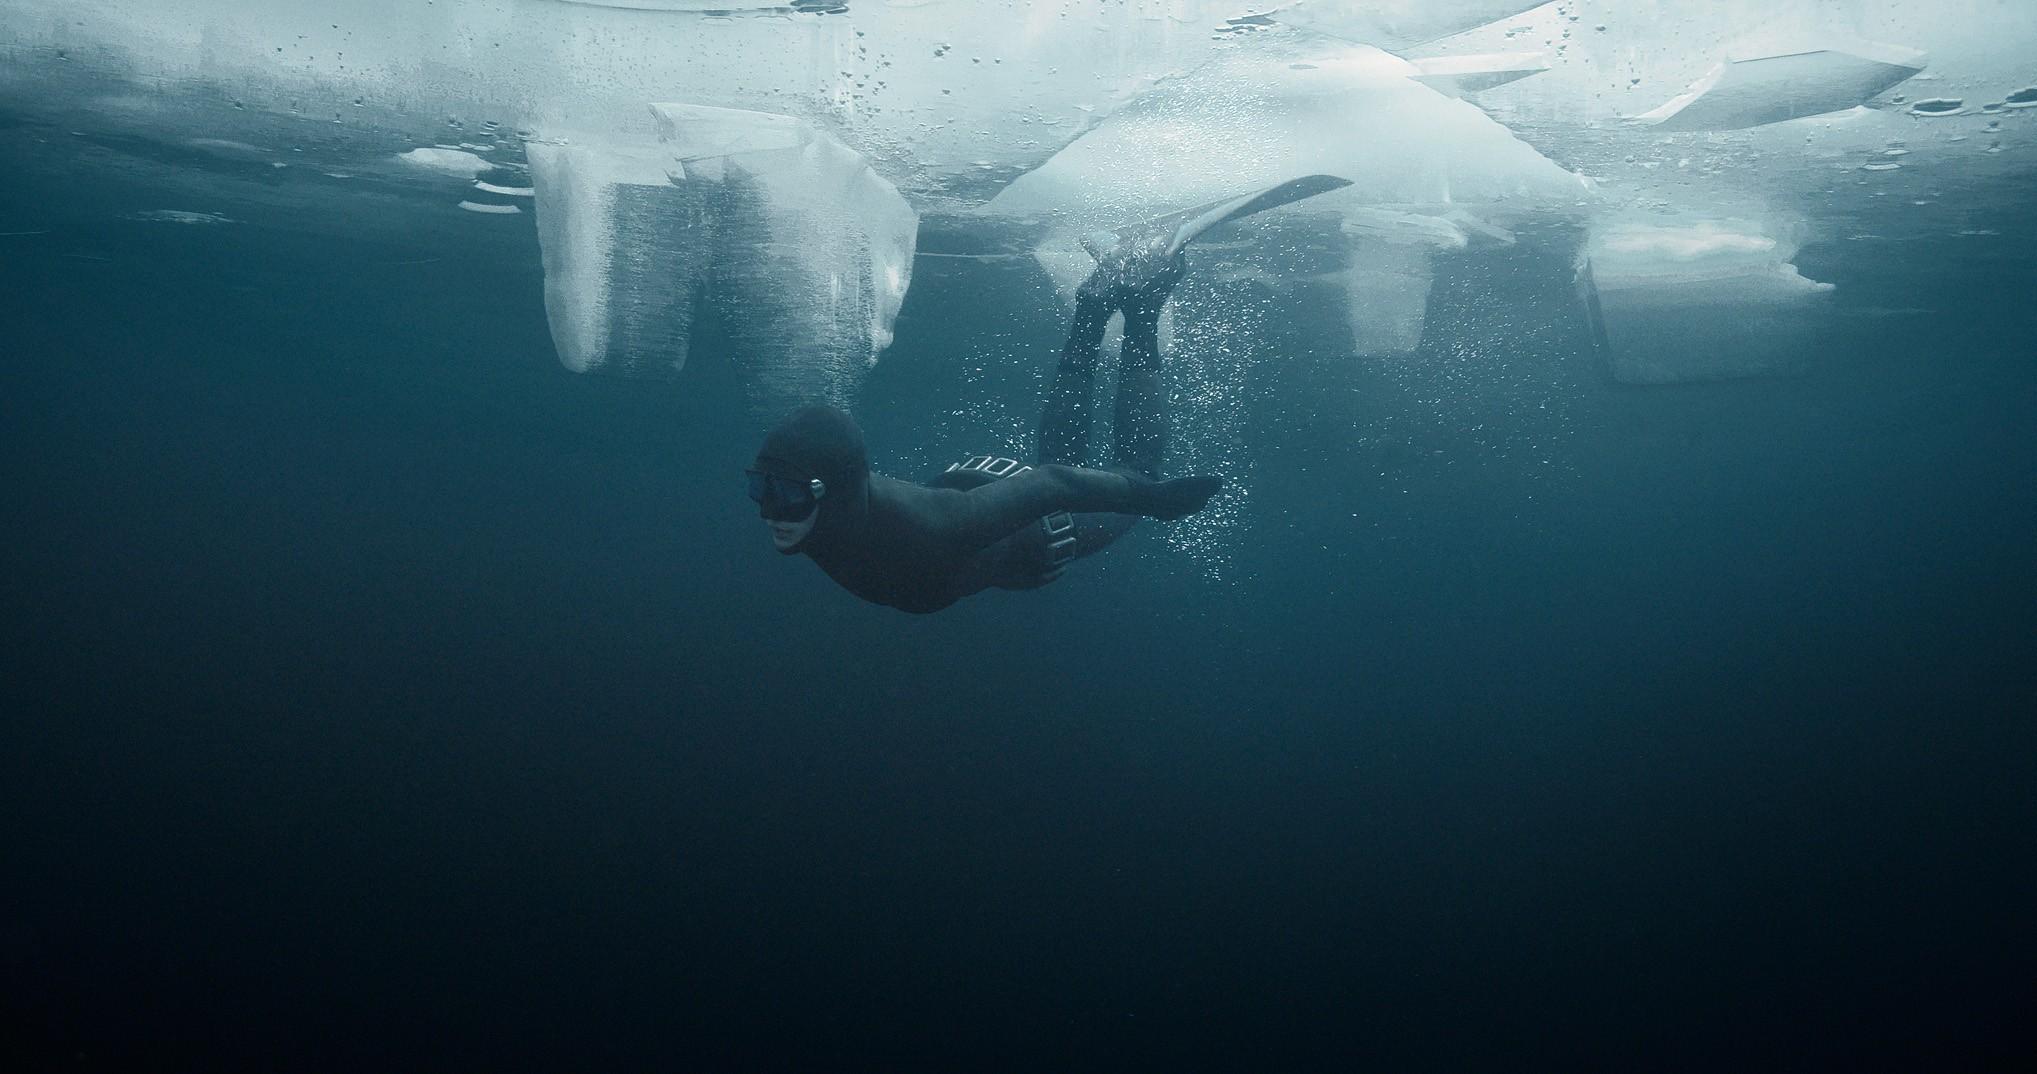 johanna-rolik-ob-ekstremalnom-zimnem-dajvinge-3